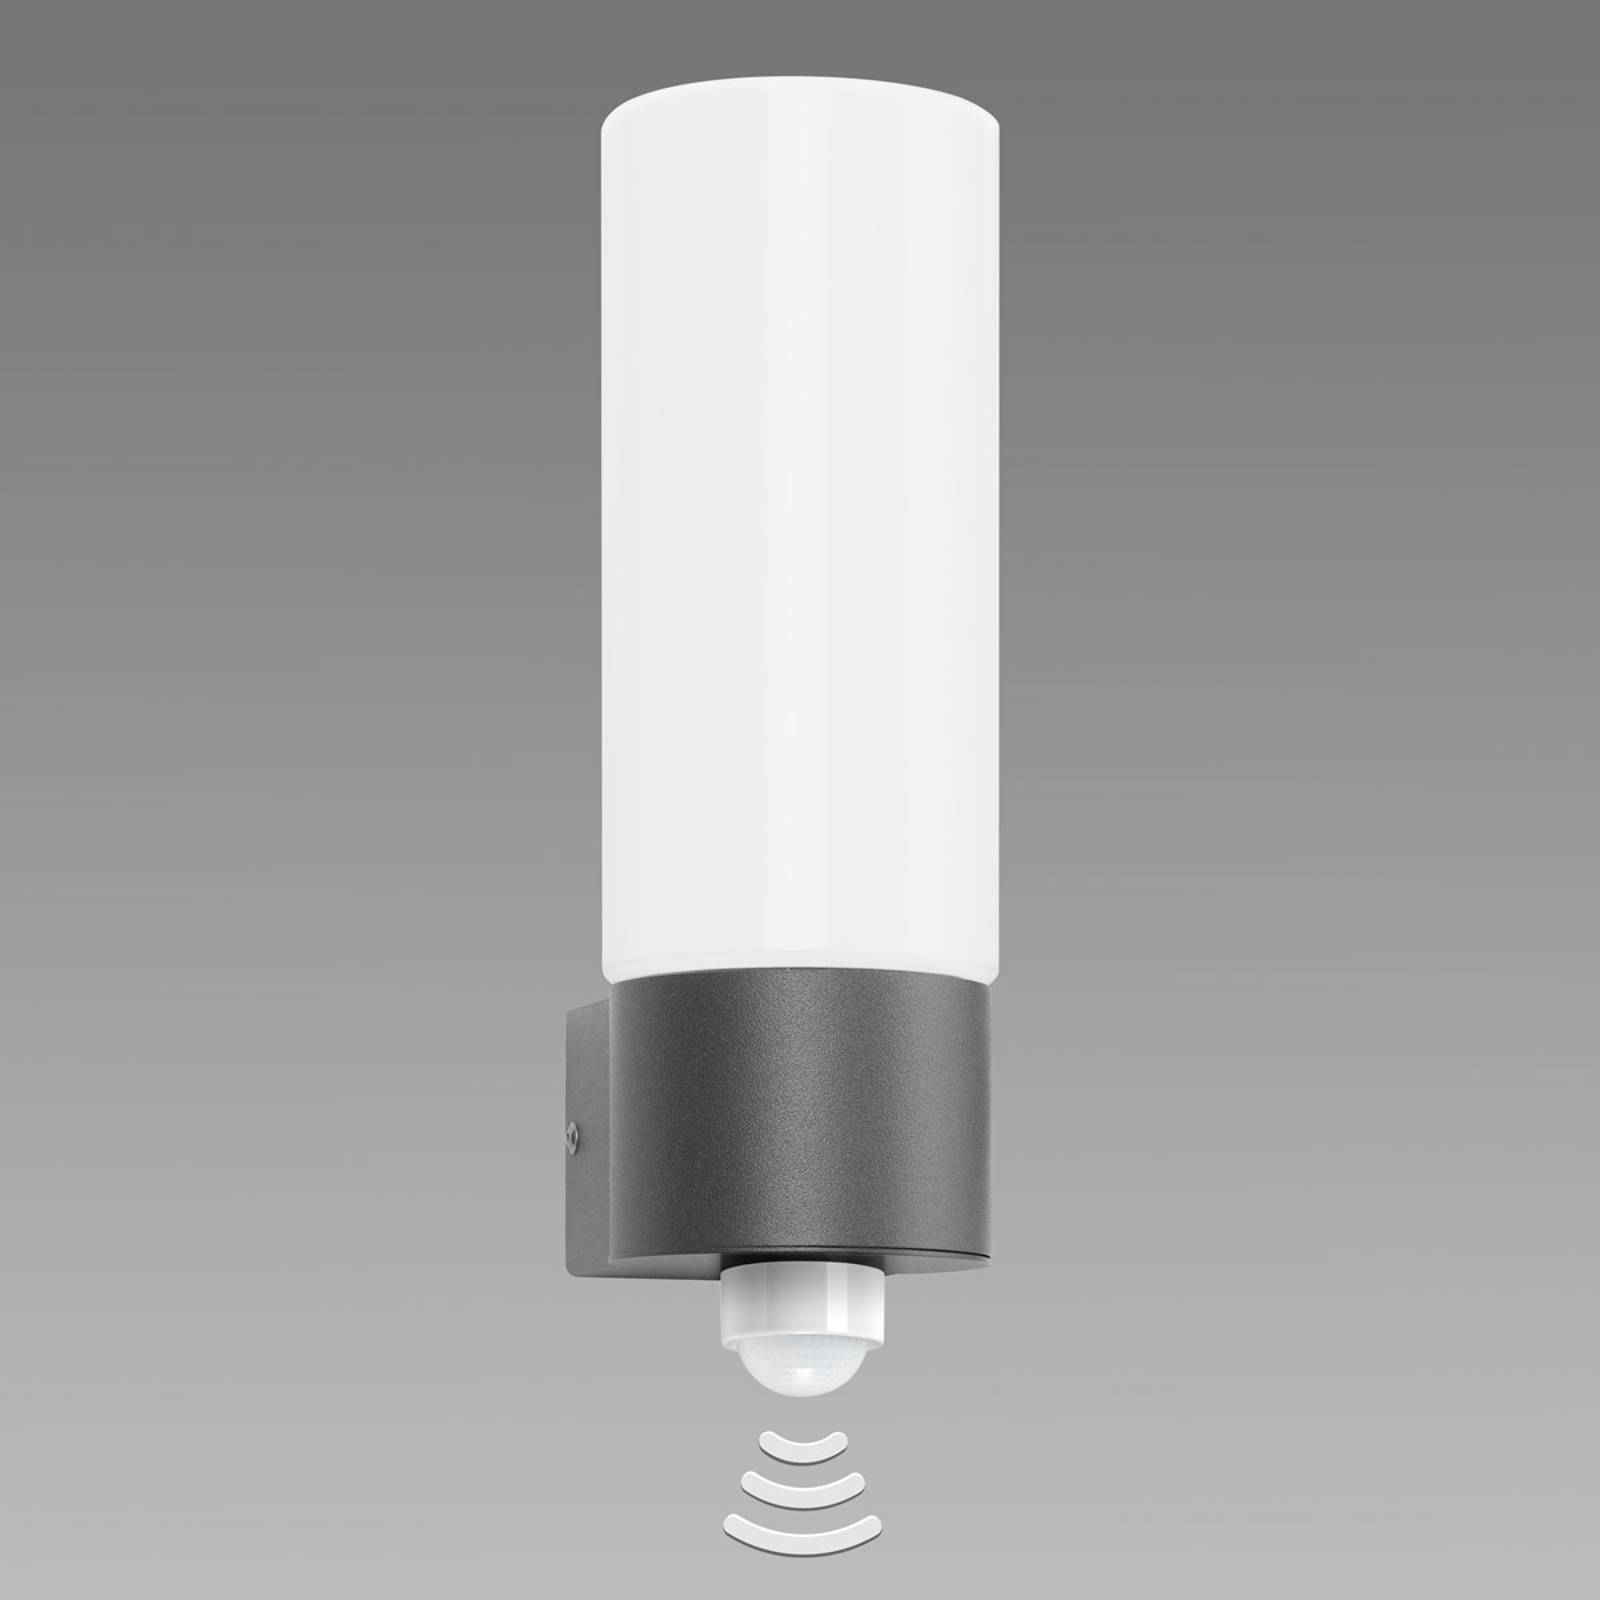 Fraaie buitenwandlamp Gray, met sensor